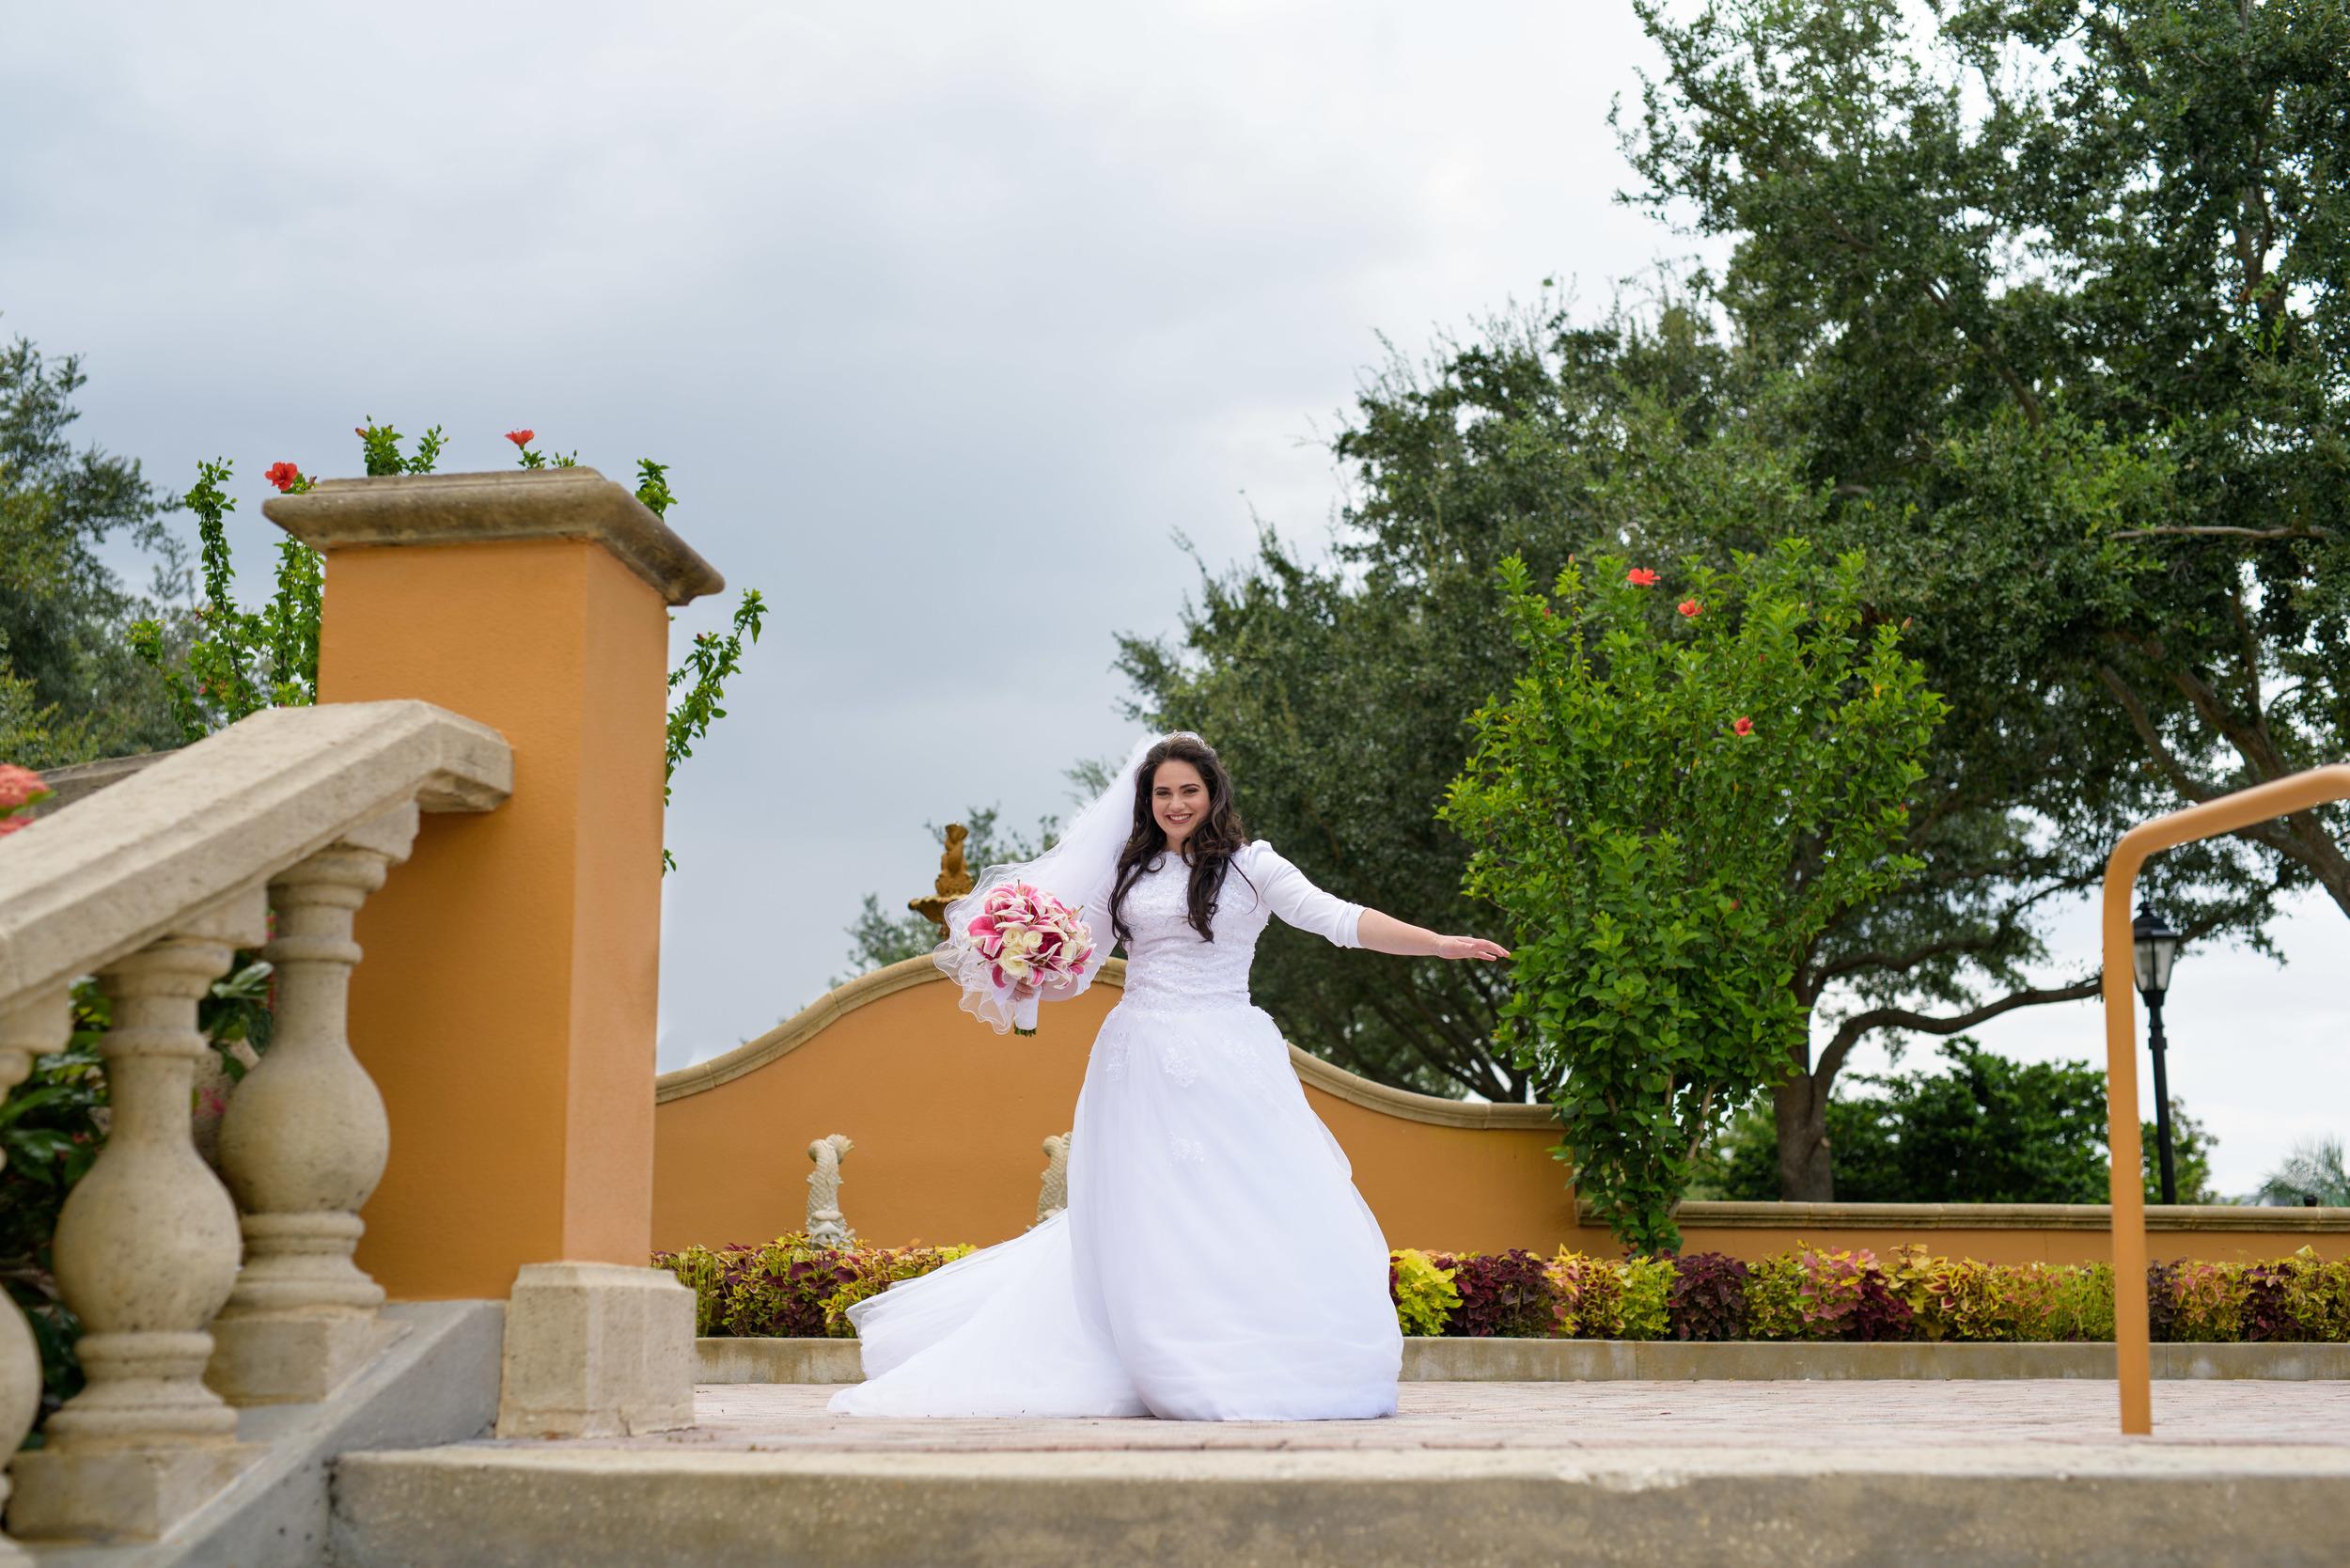 Wedding by Levikfoto.com-069.jpg